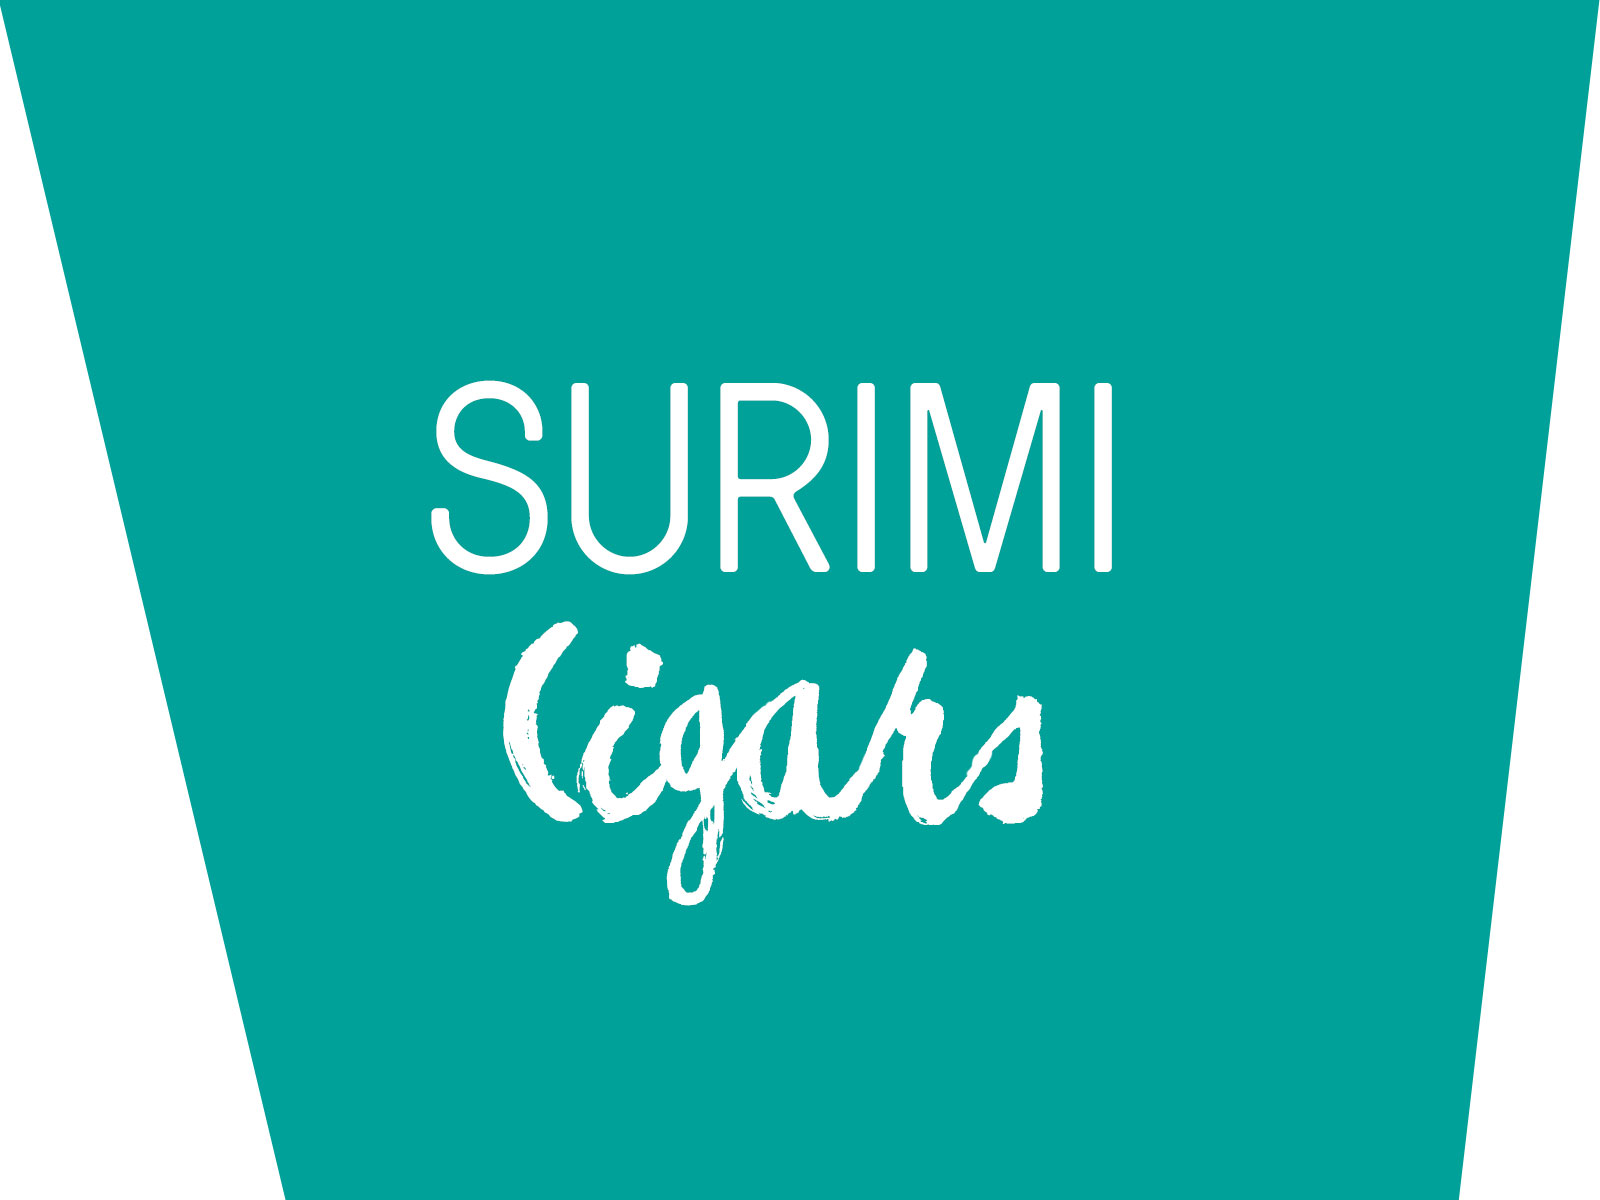 SEA LEGS® Surimi Cigars